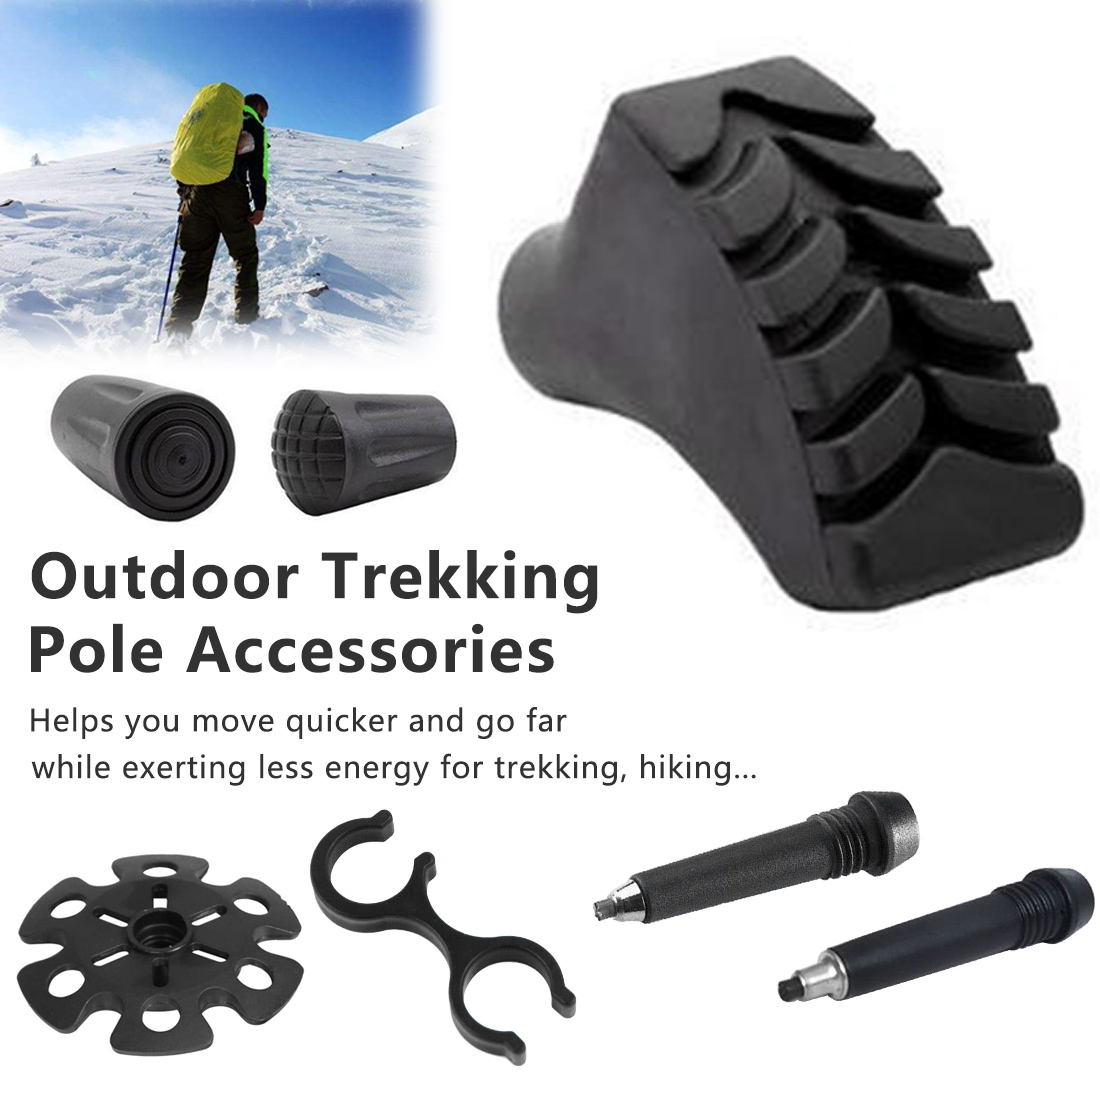 Hike Telescope Stick Nordic Walk Camp Ski Foot Crutch Bar Bag Climbing Shoes Snow Mooring Mud Tray  Spare Part Accessory